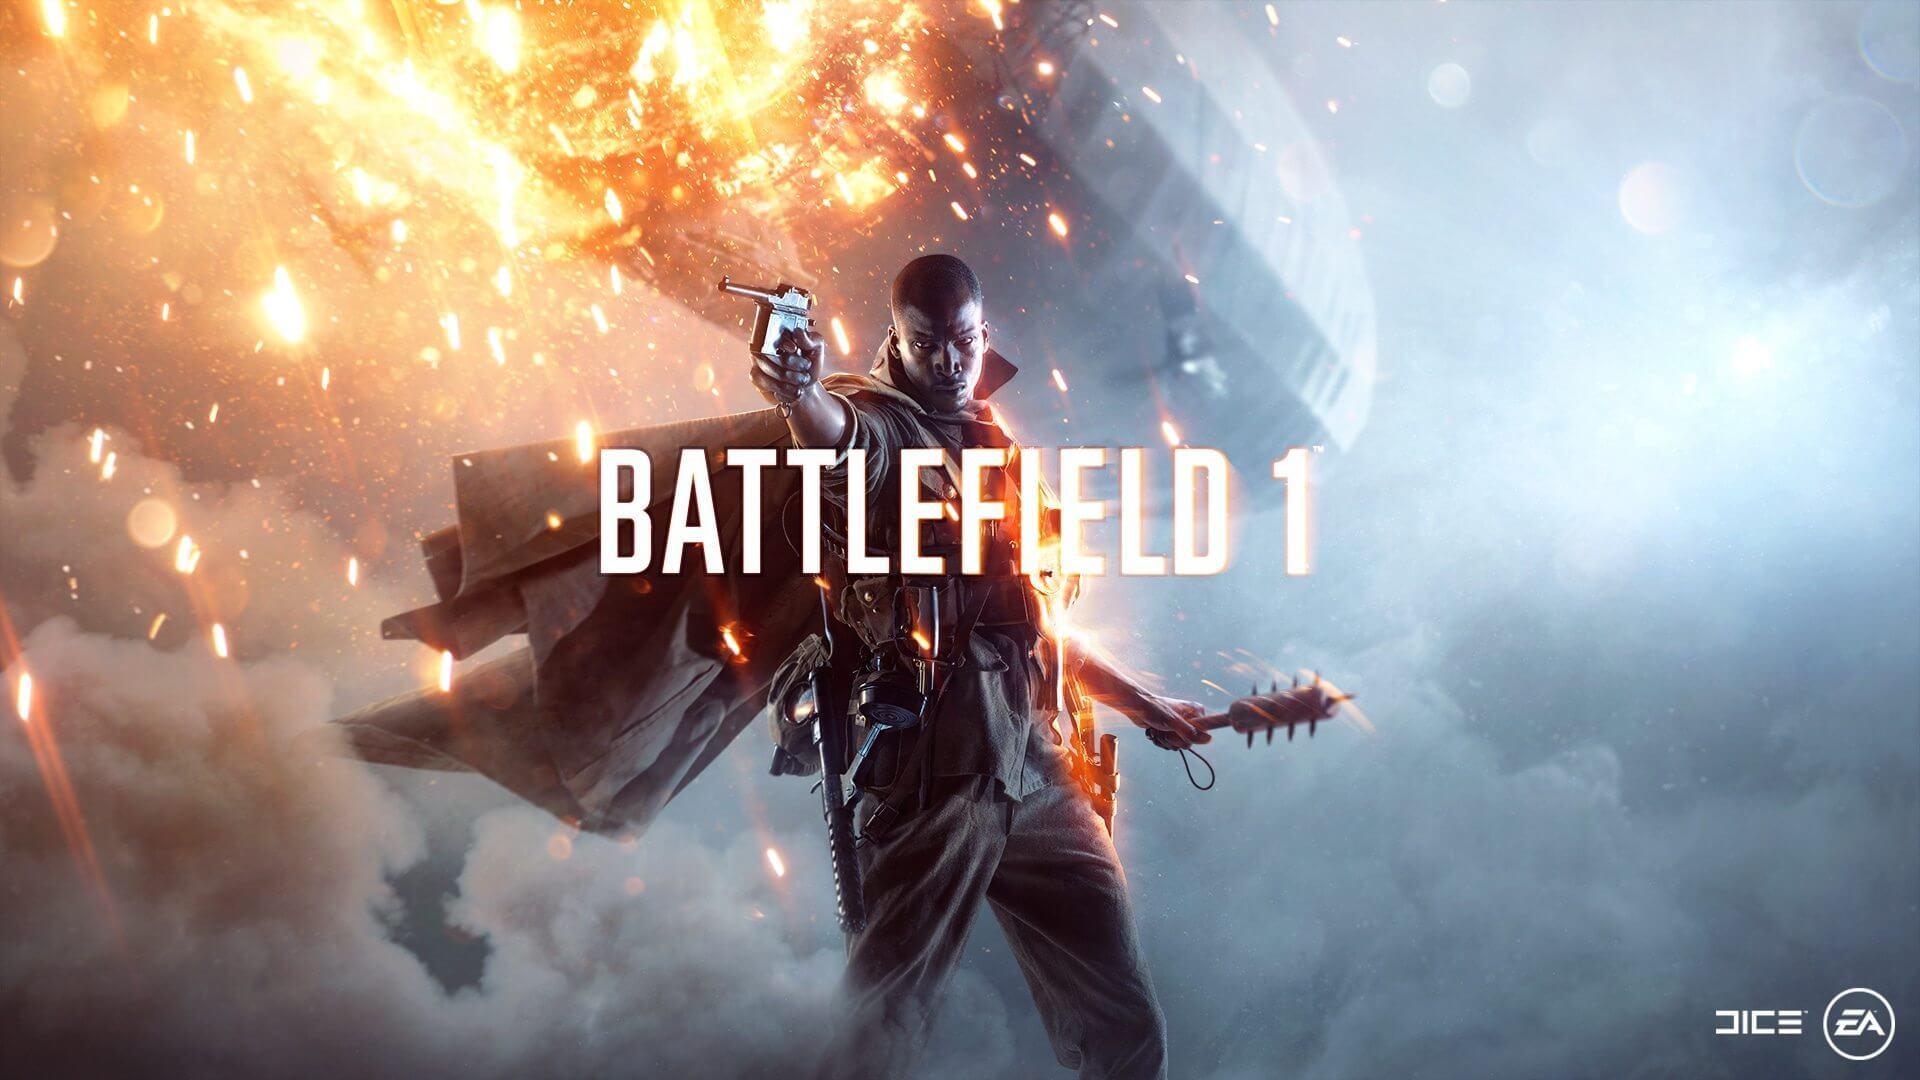 Assista ao vivo a primeira gameplay de Battlefield 1 na E3 2016